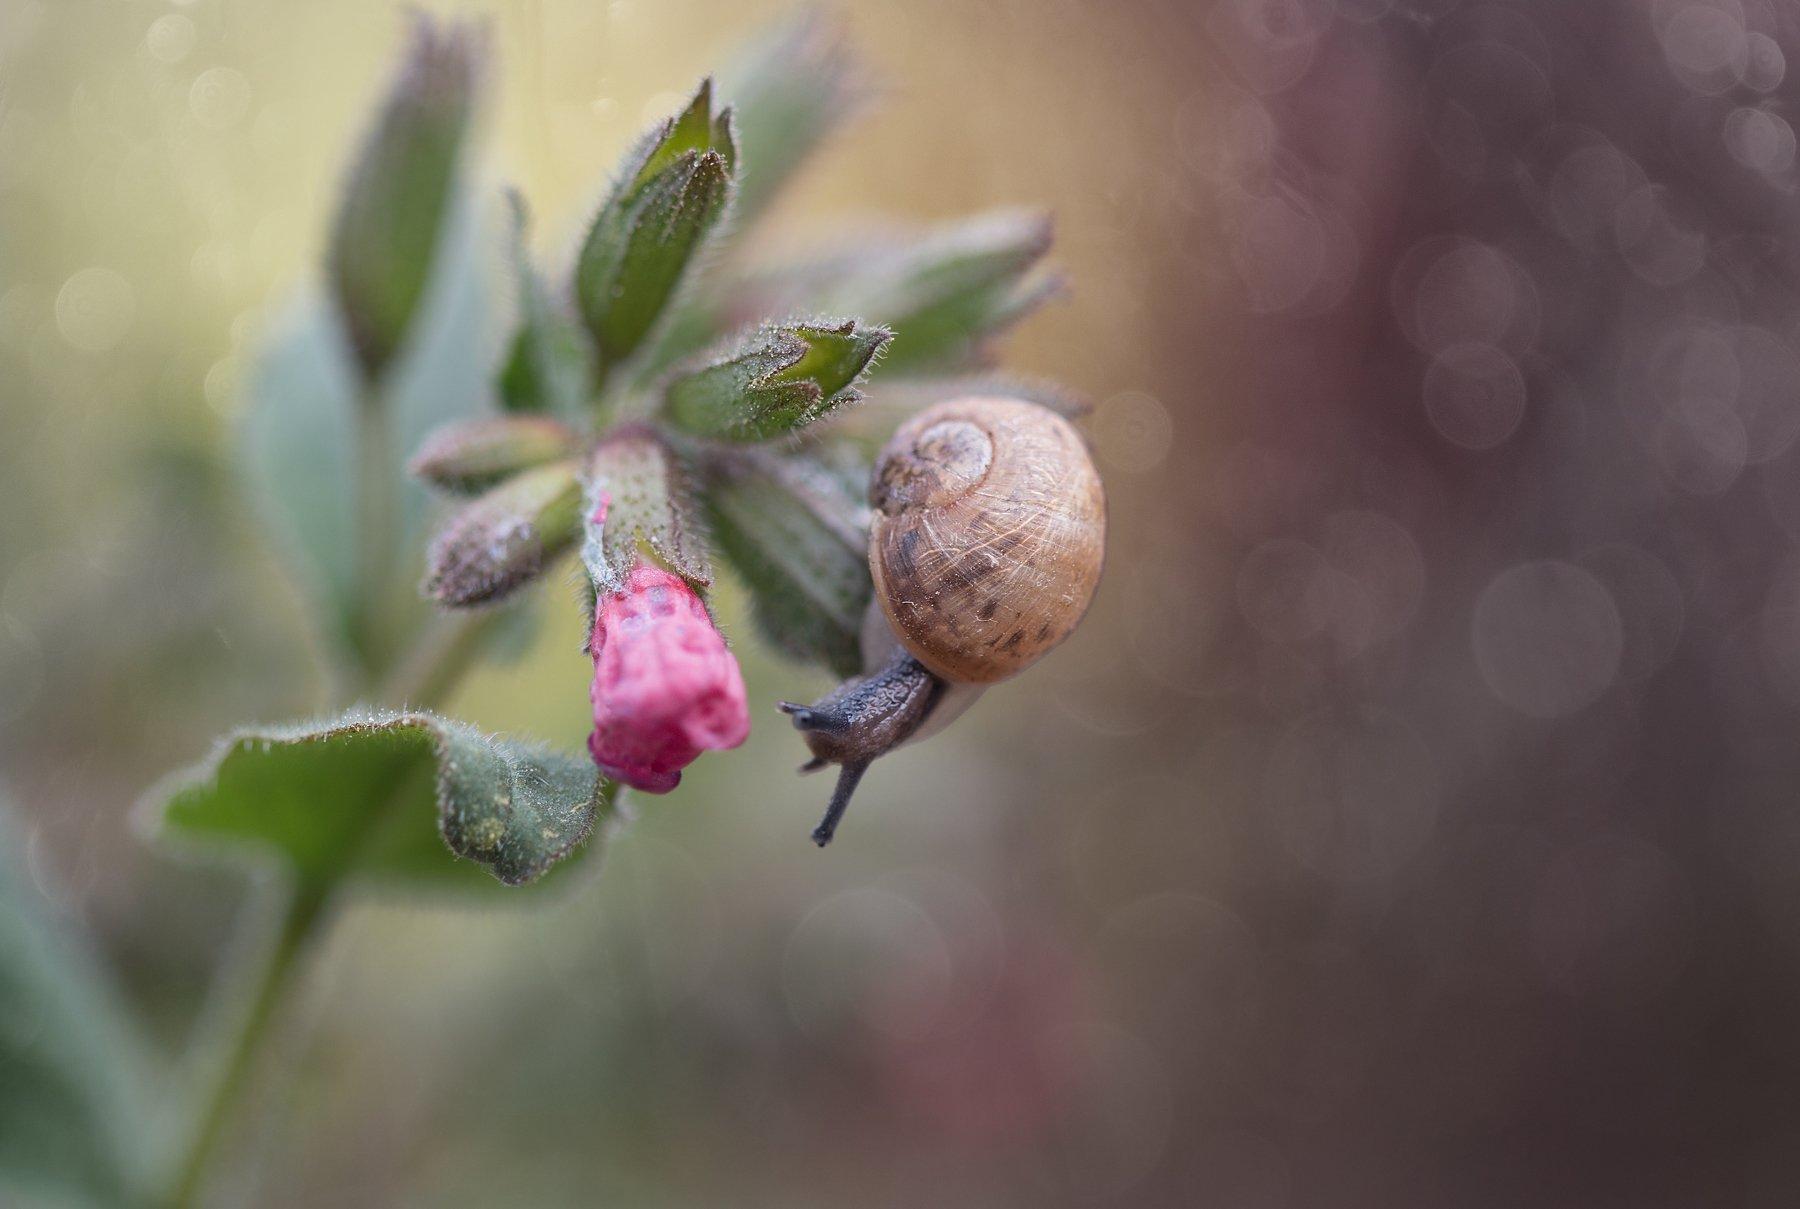 улитка, макро, красота, природа, цветы, весна, snail, spring, macro, nature, Гудина Людмила